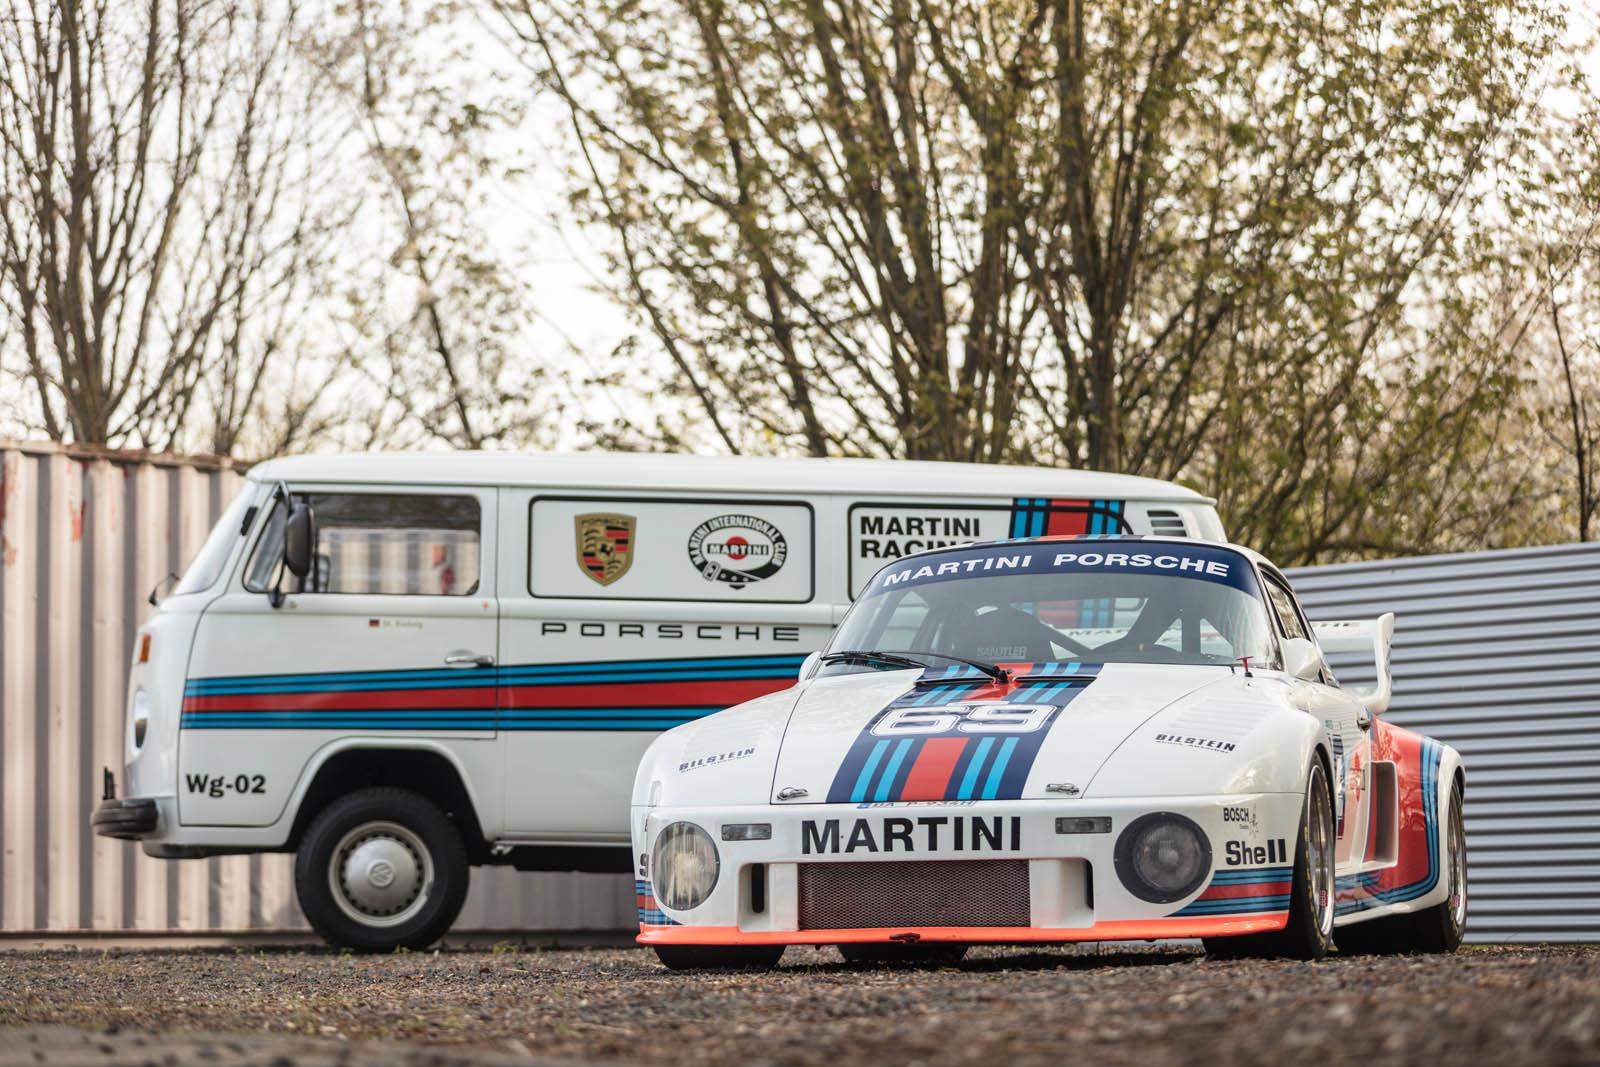 martini-porsche935-vwbus-0049-2%2Bcopy.jpg